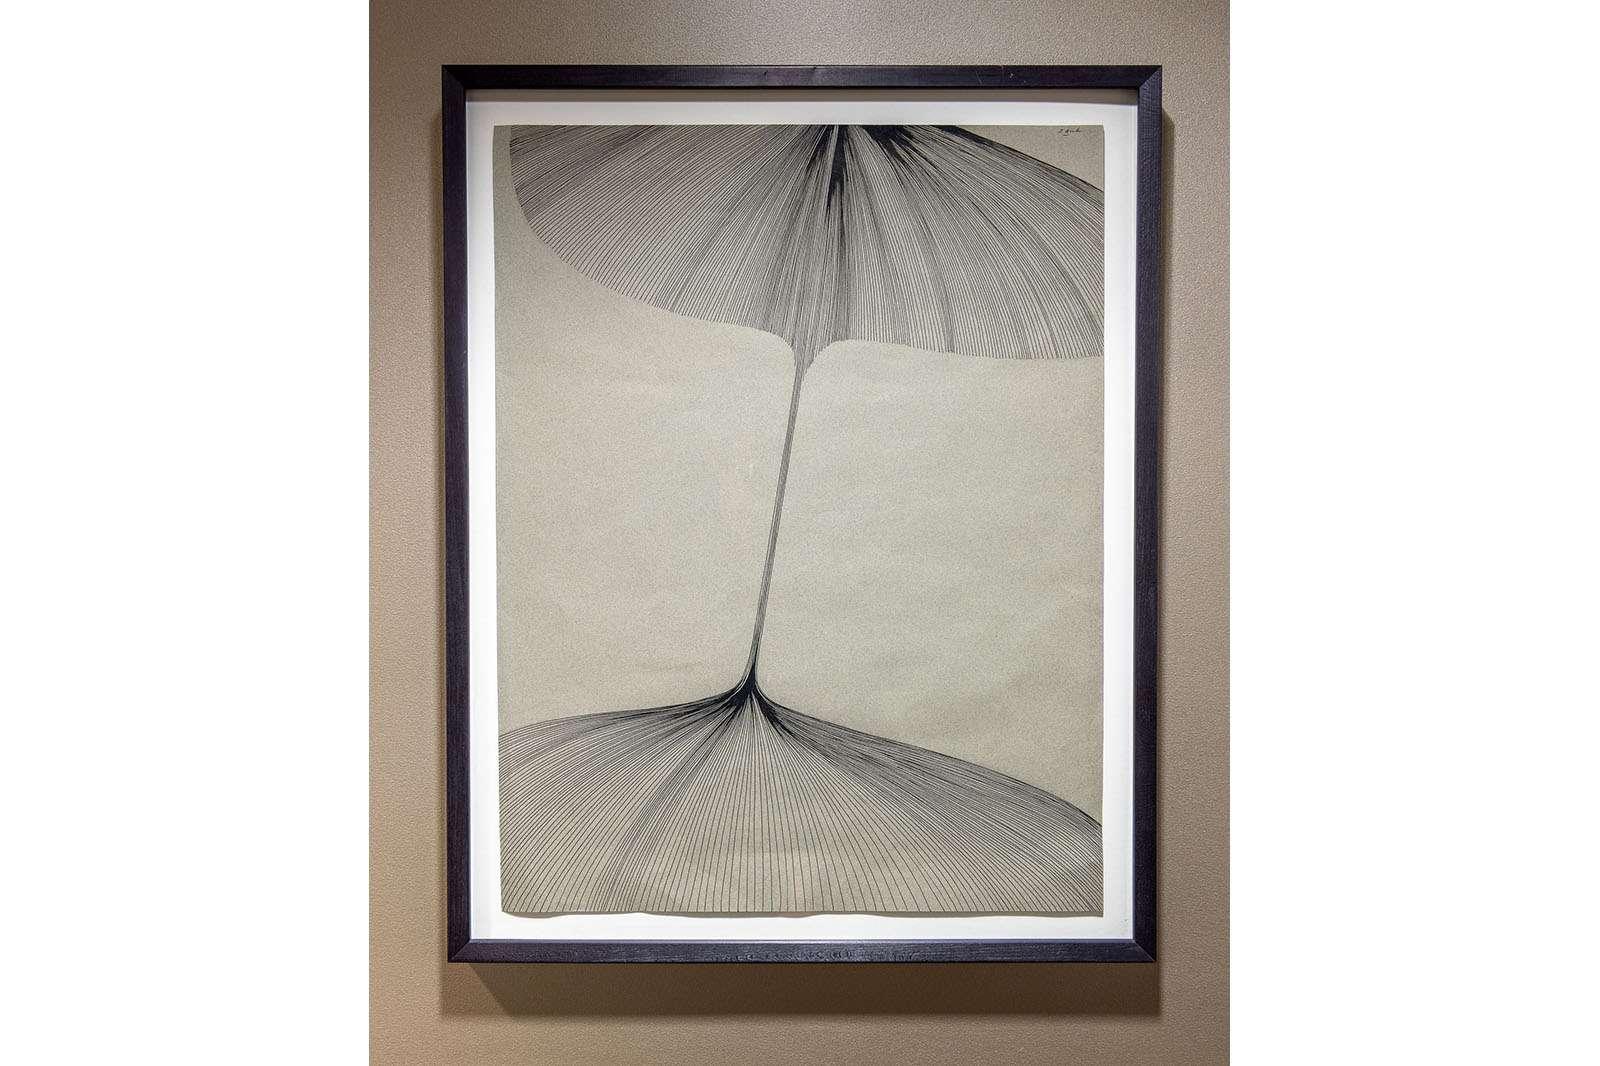 Dorothy Hood, Brancusi's Flower, 1972. Ink on paper. Photo by Nash Baker.